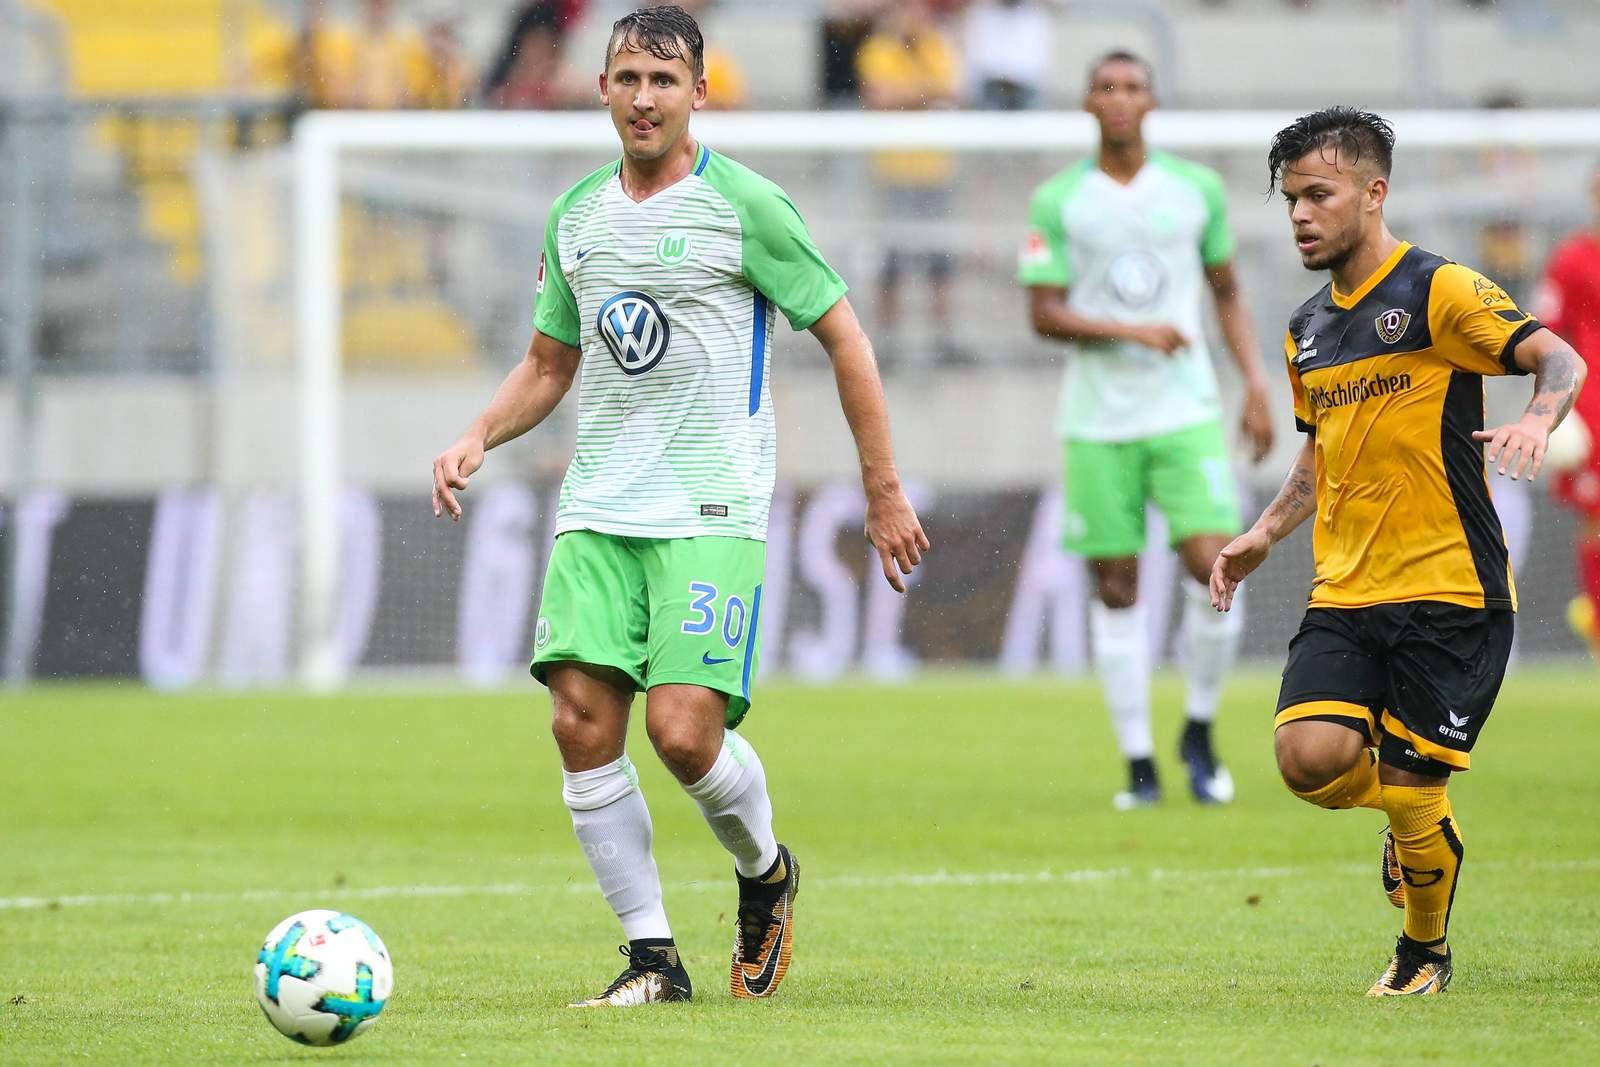 Paul Seguin, Profi beim VfL Wolfsburg